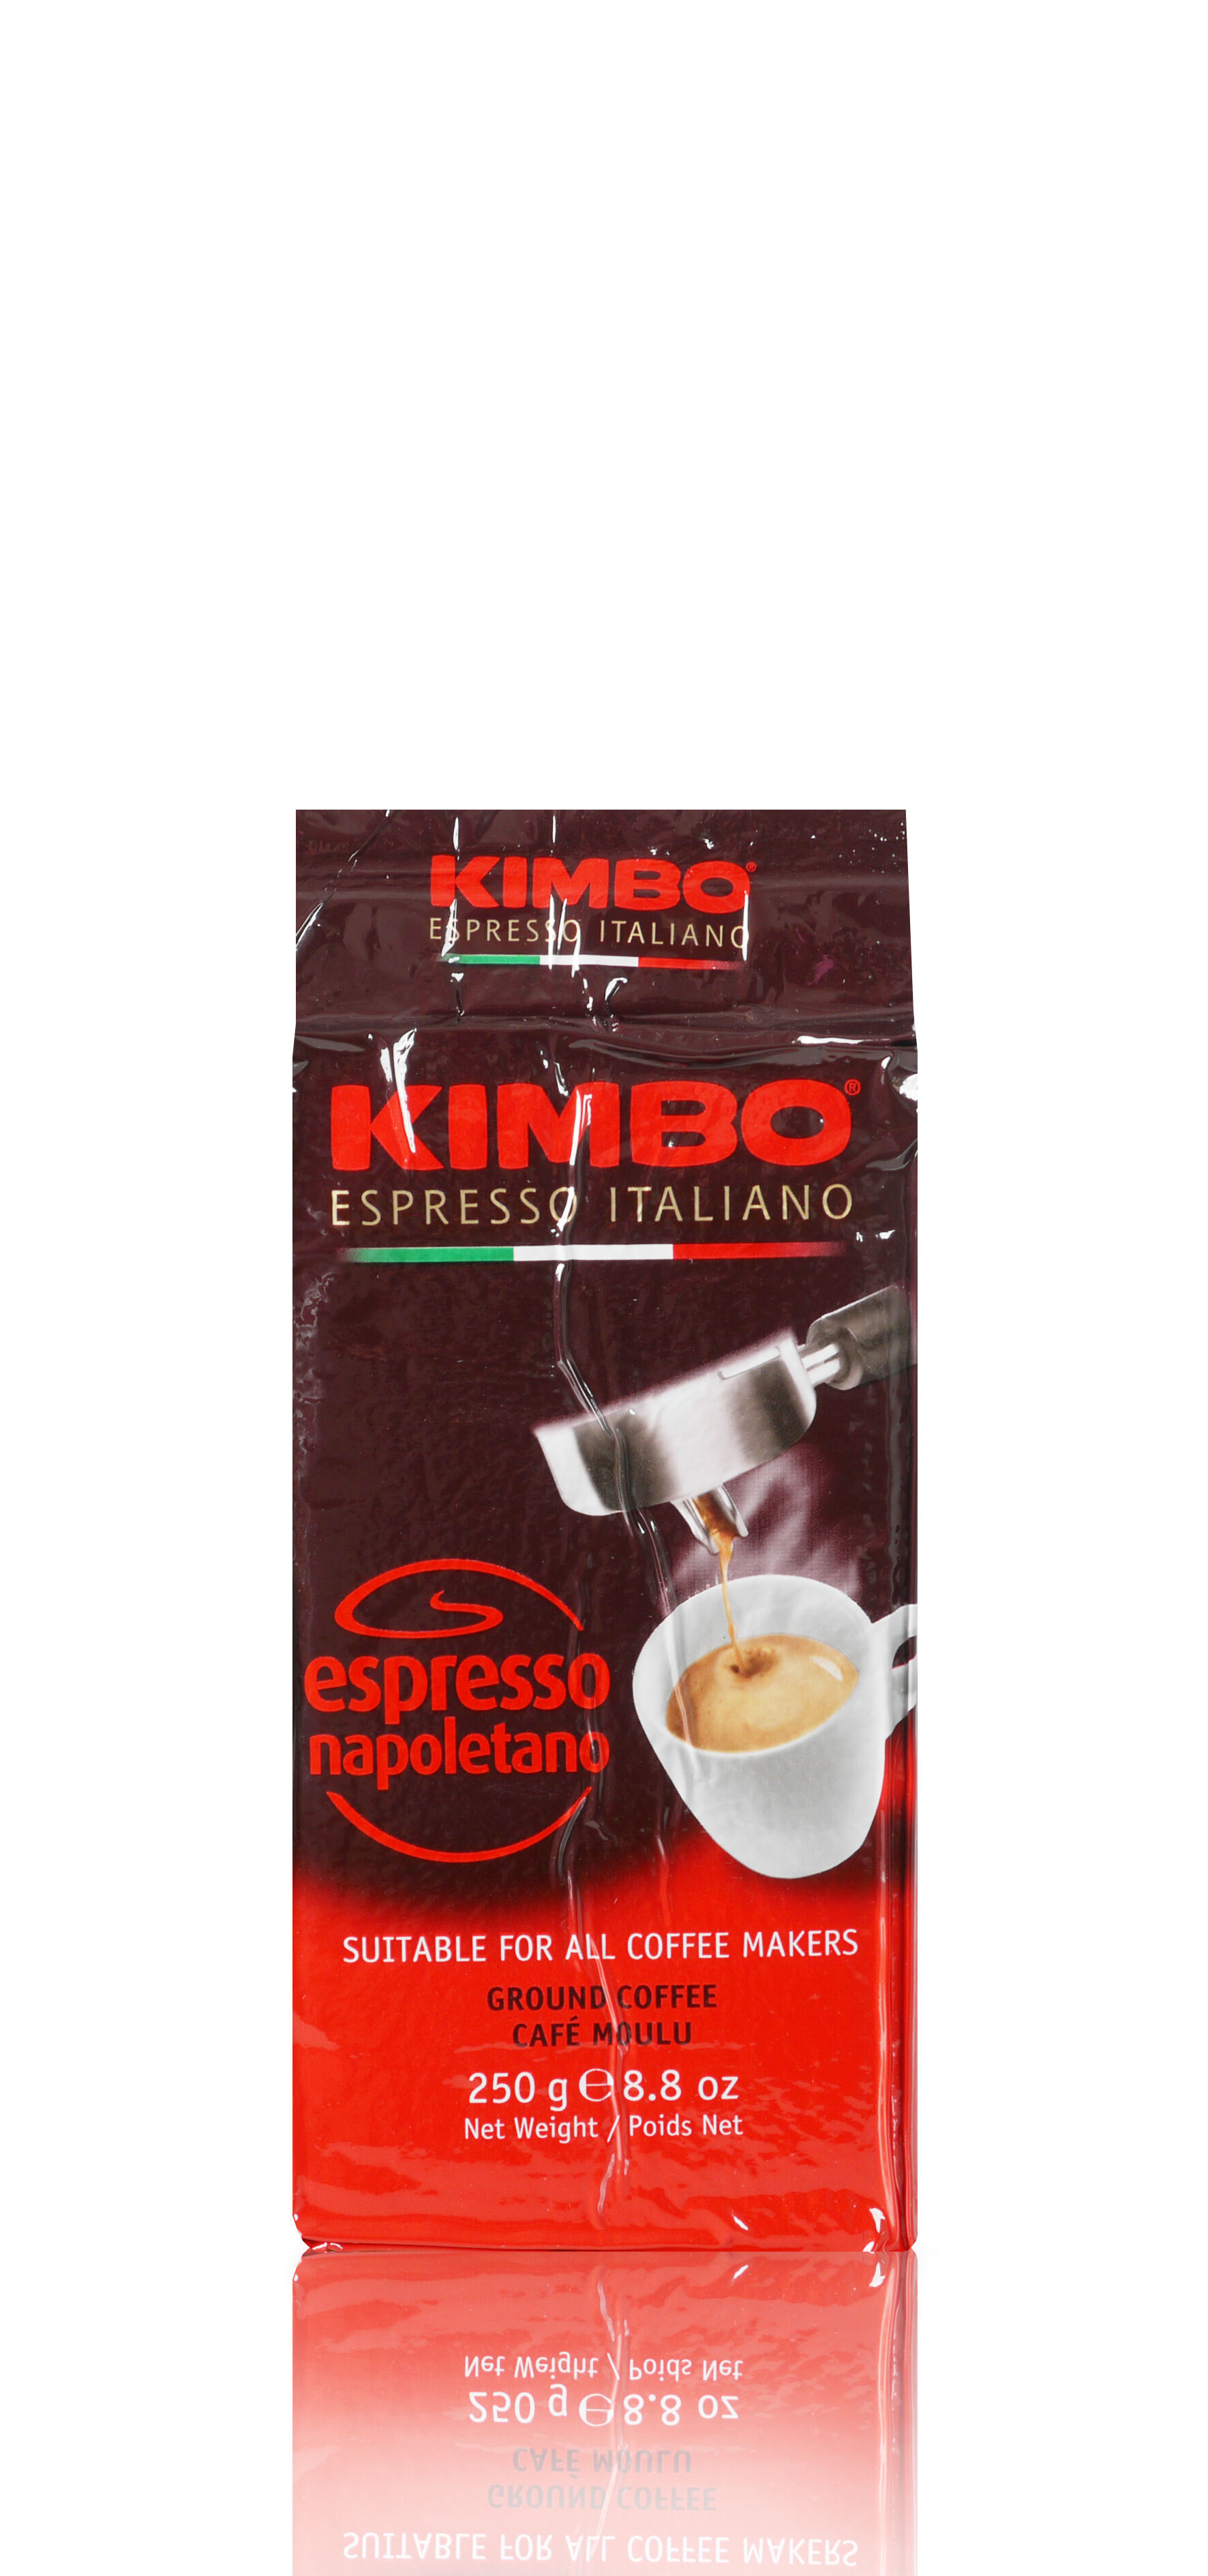 KIMBO Espresso Napoletano 20x 250 g gemahlen und vakuumiert